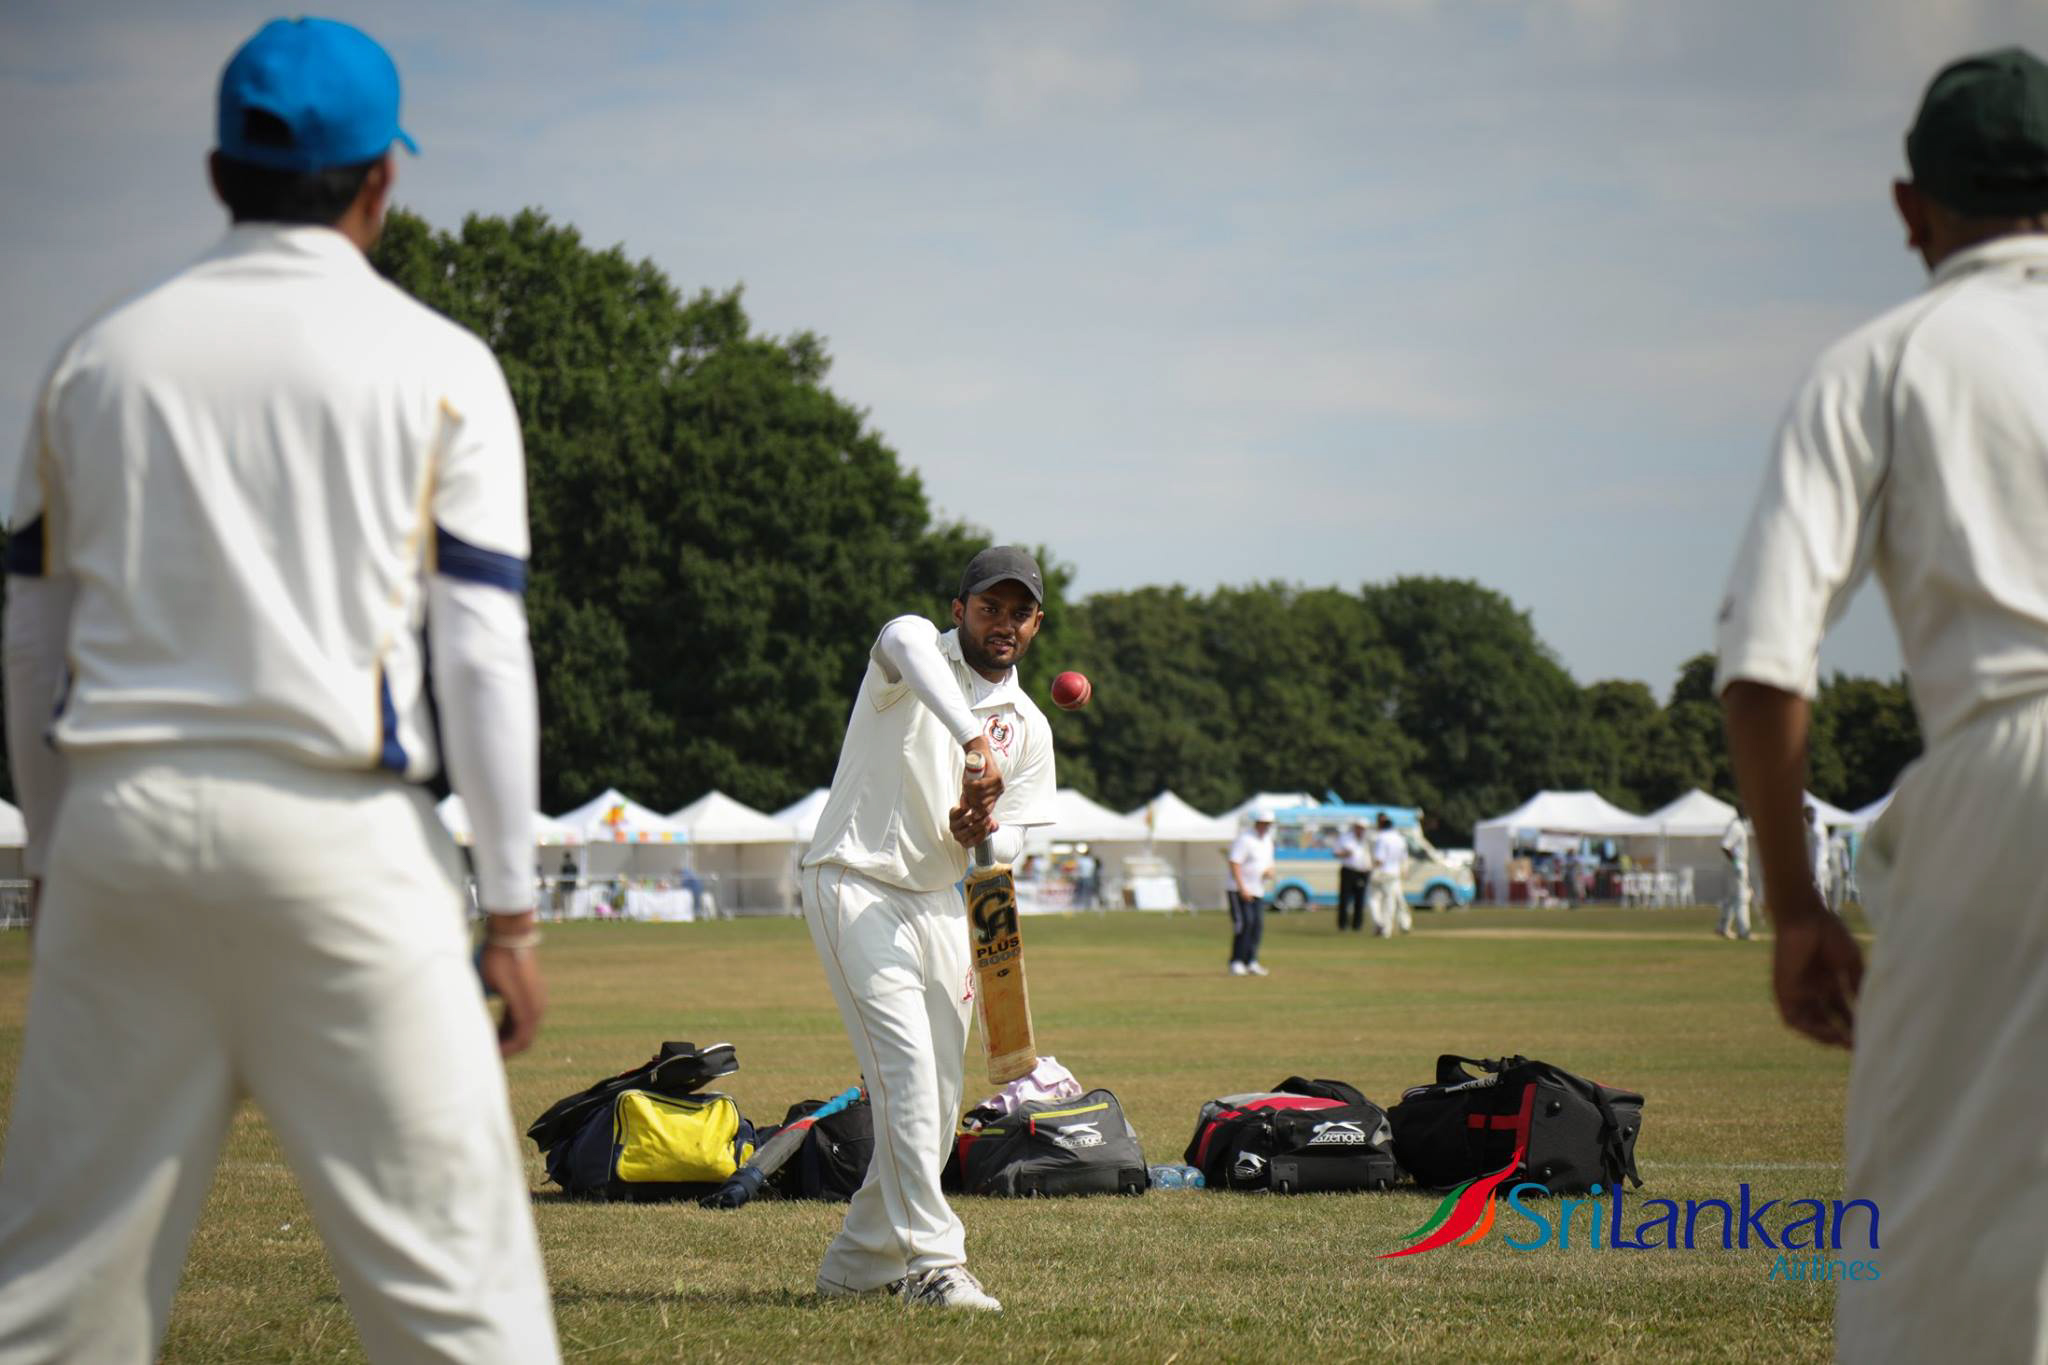 Sri-Lankan-airlines-cricket-festival-london-2017-natalia-smith--photography-26.jpg